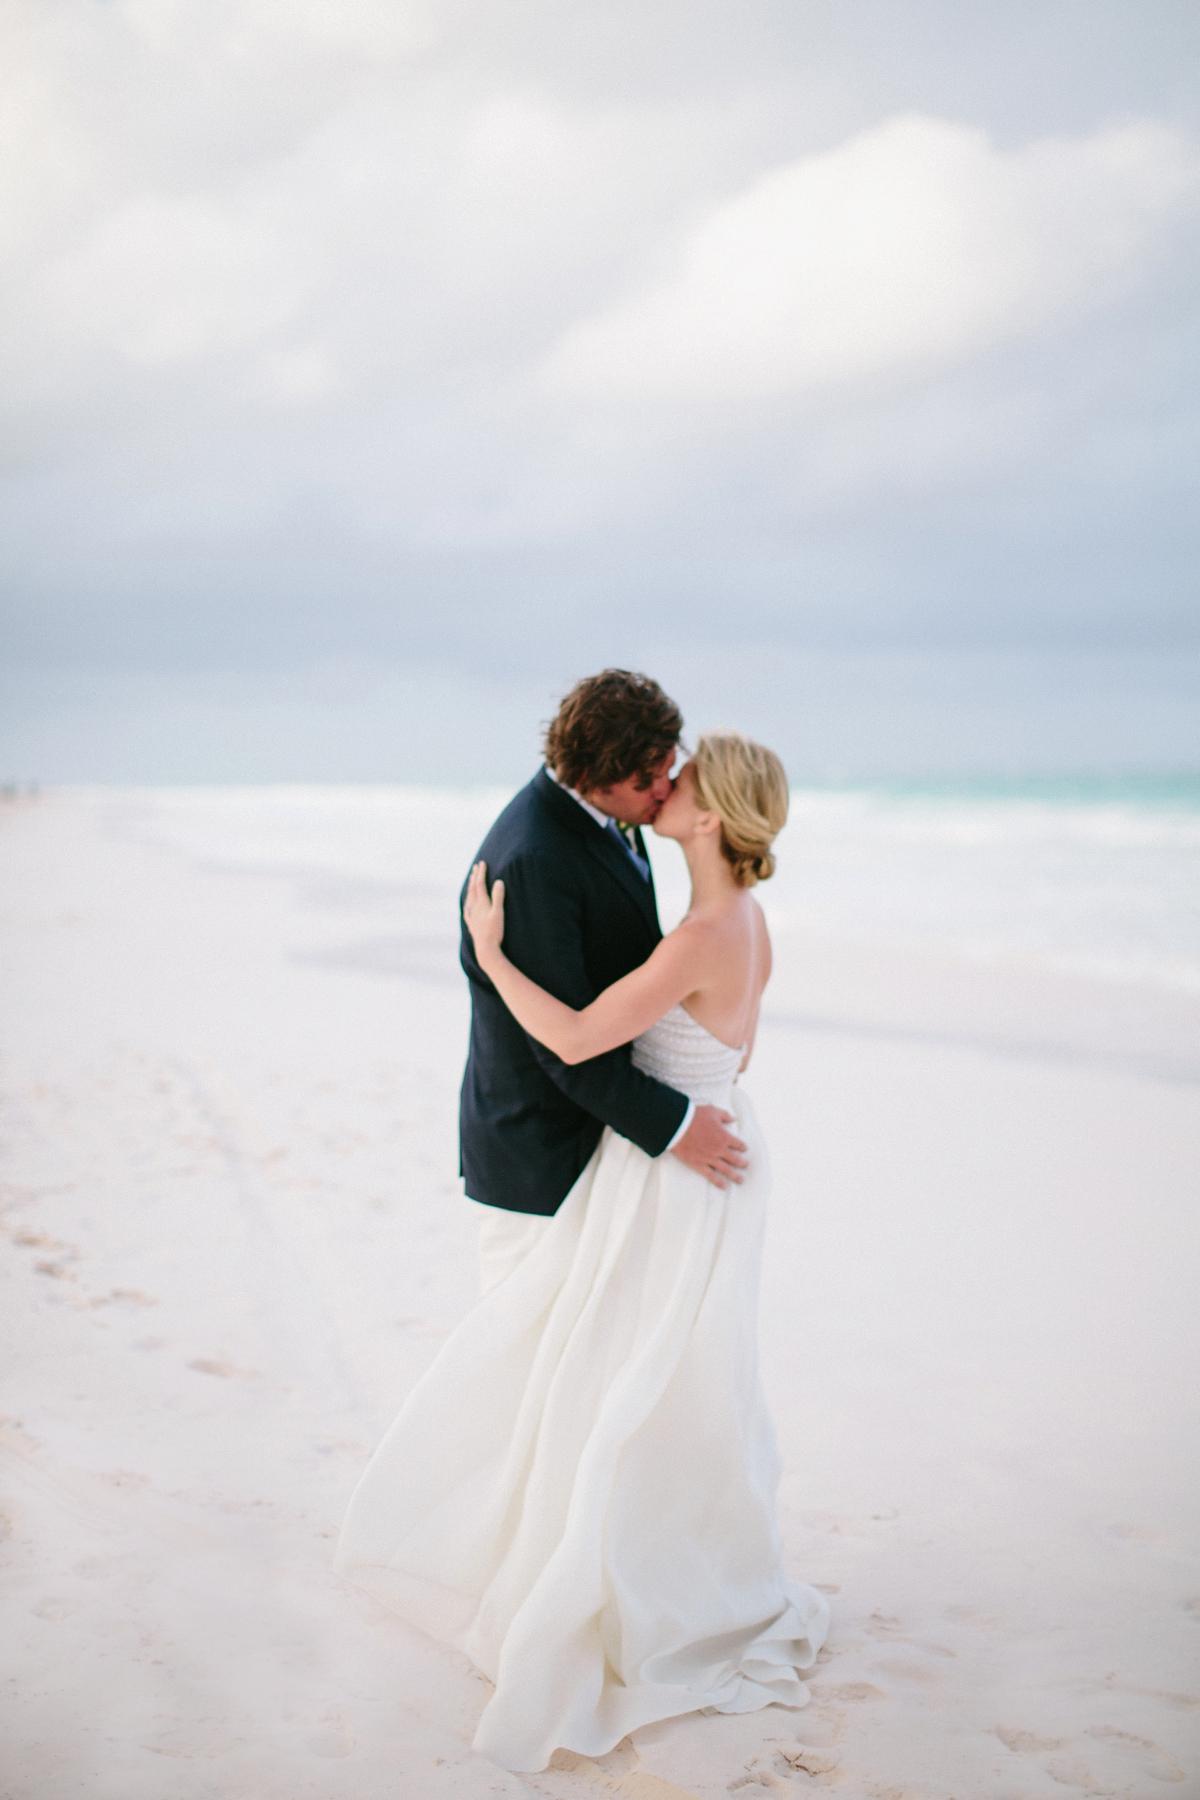 harbour_island-wedding-photographer-briland-destination-_0036.jpg